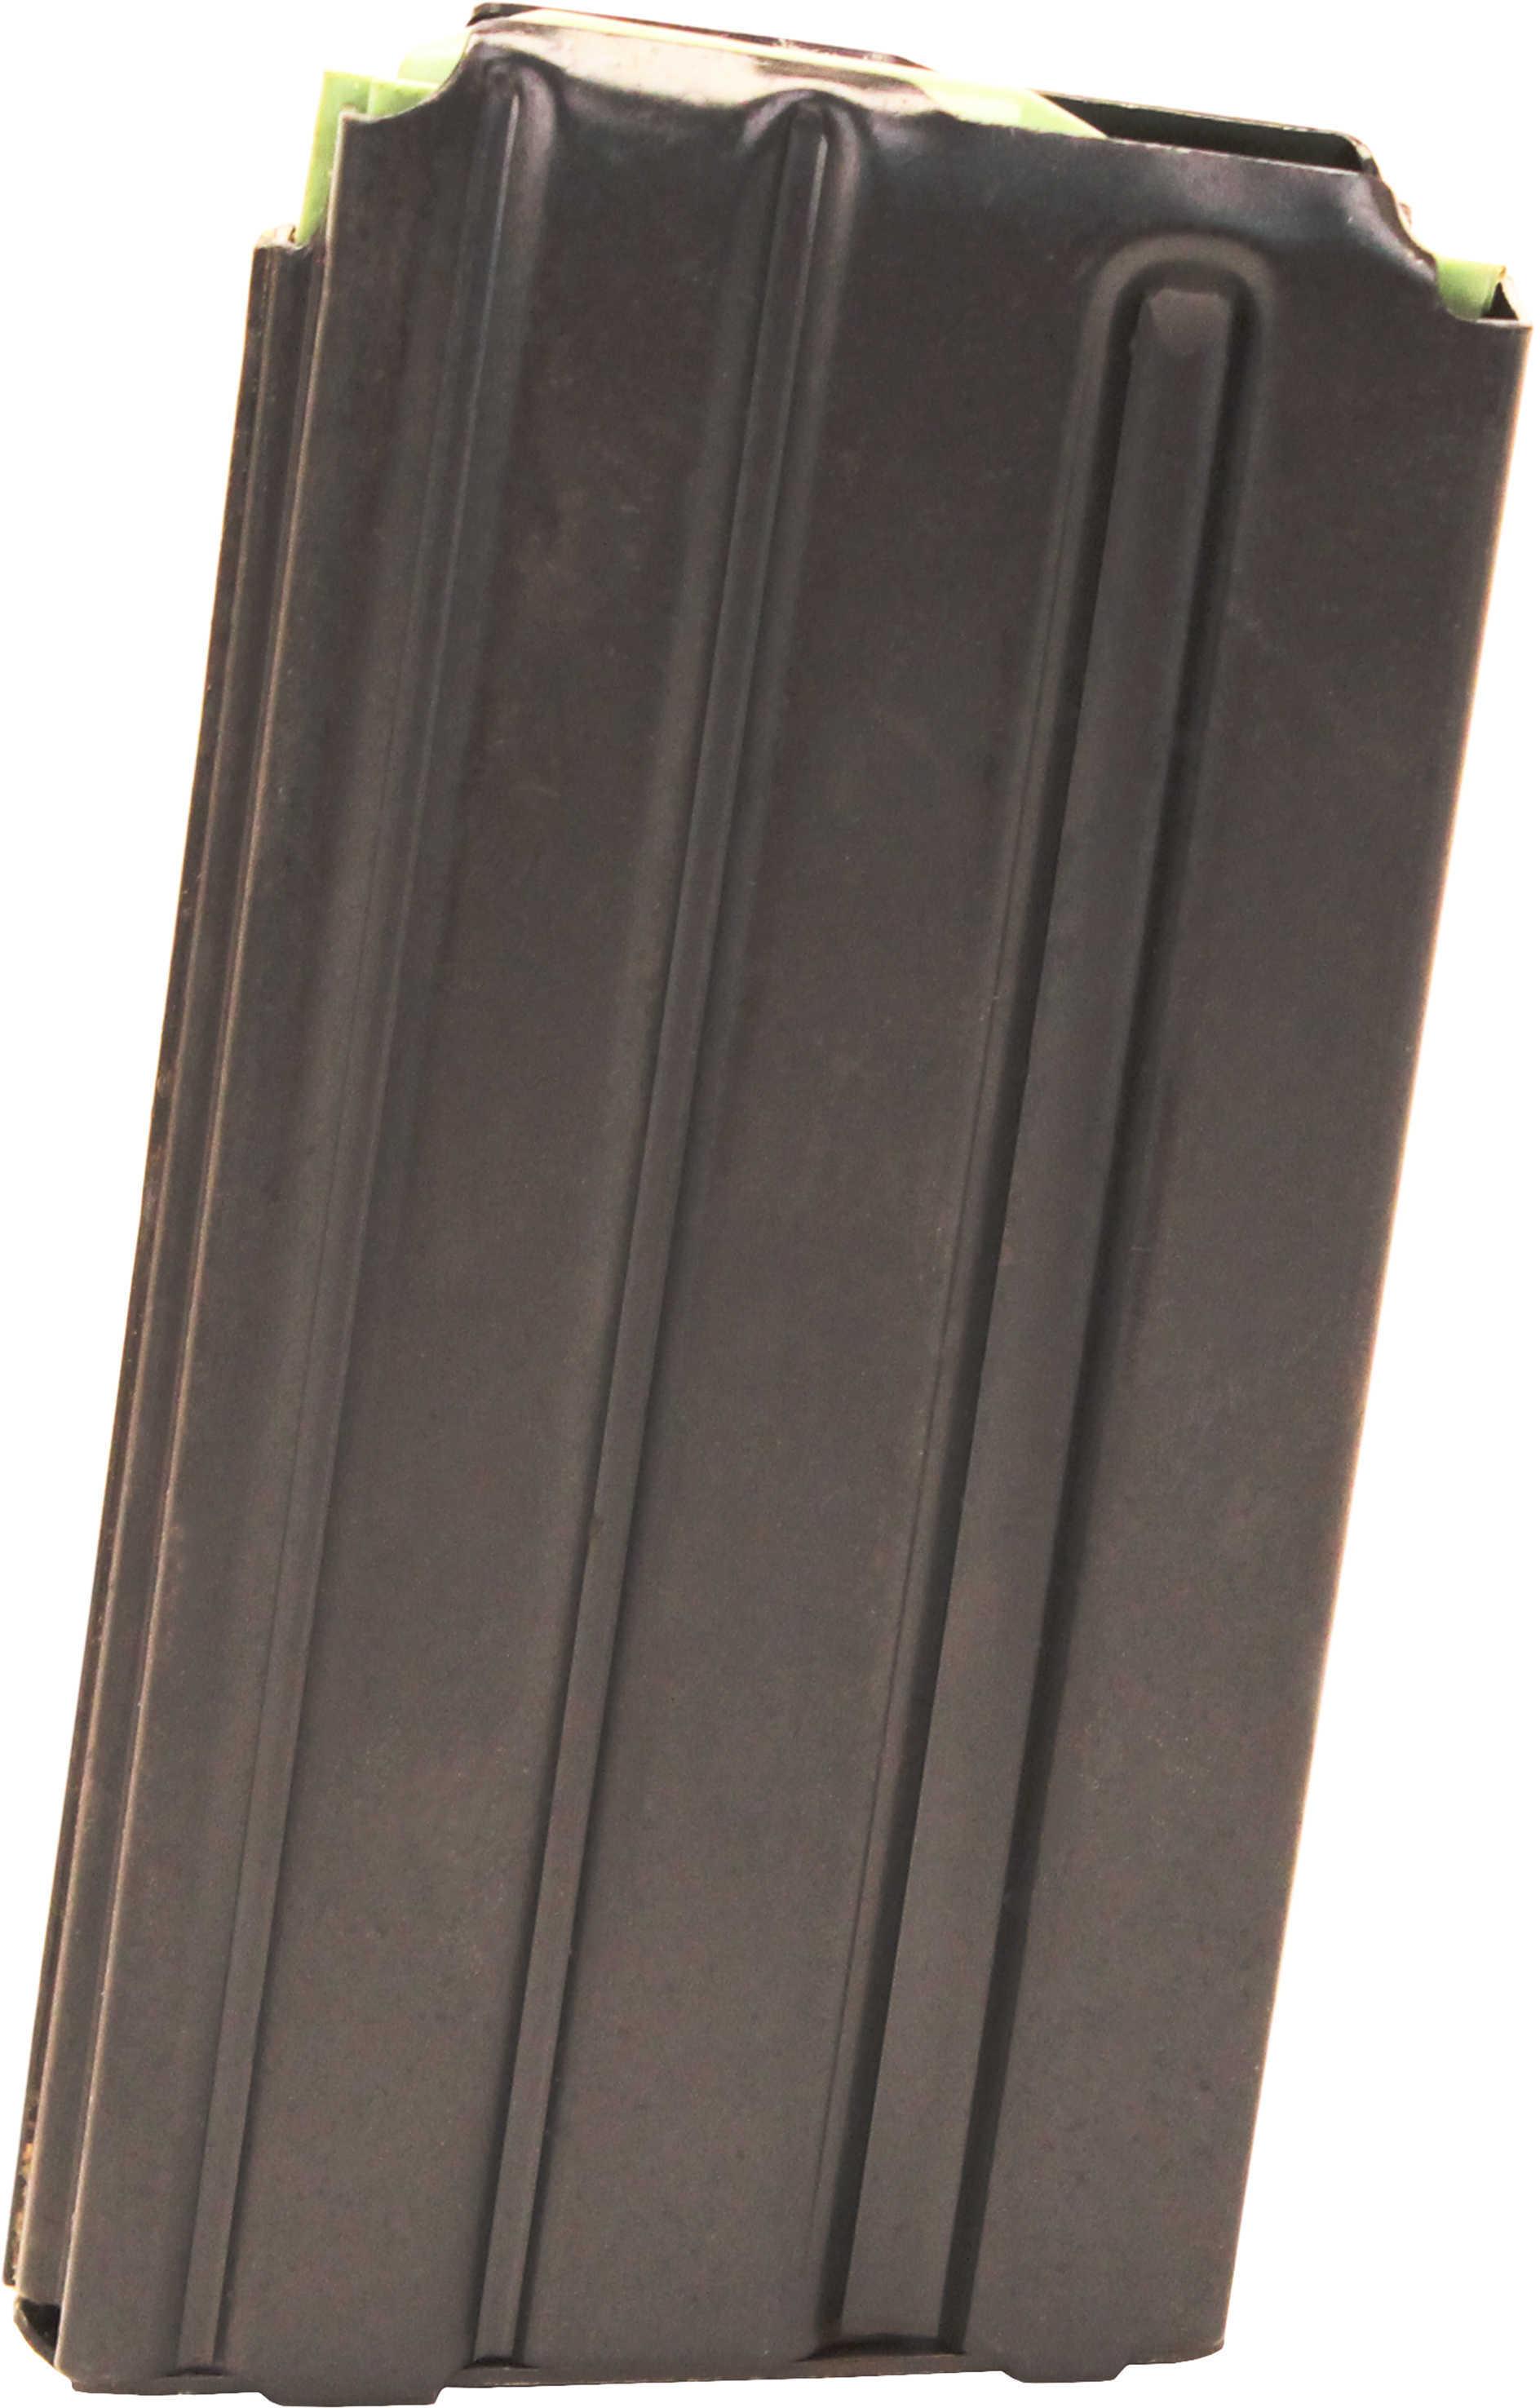 Colt AR-15 223 Magazine 20 Round, Steel Md: Col-A4